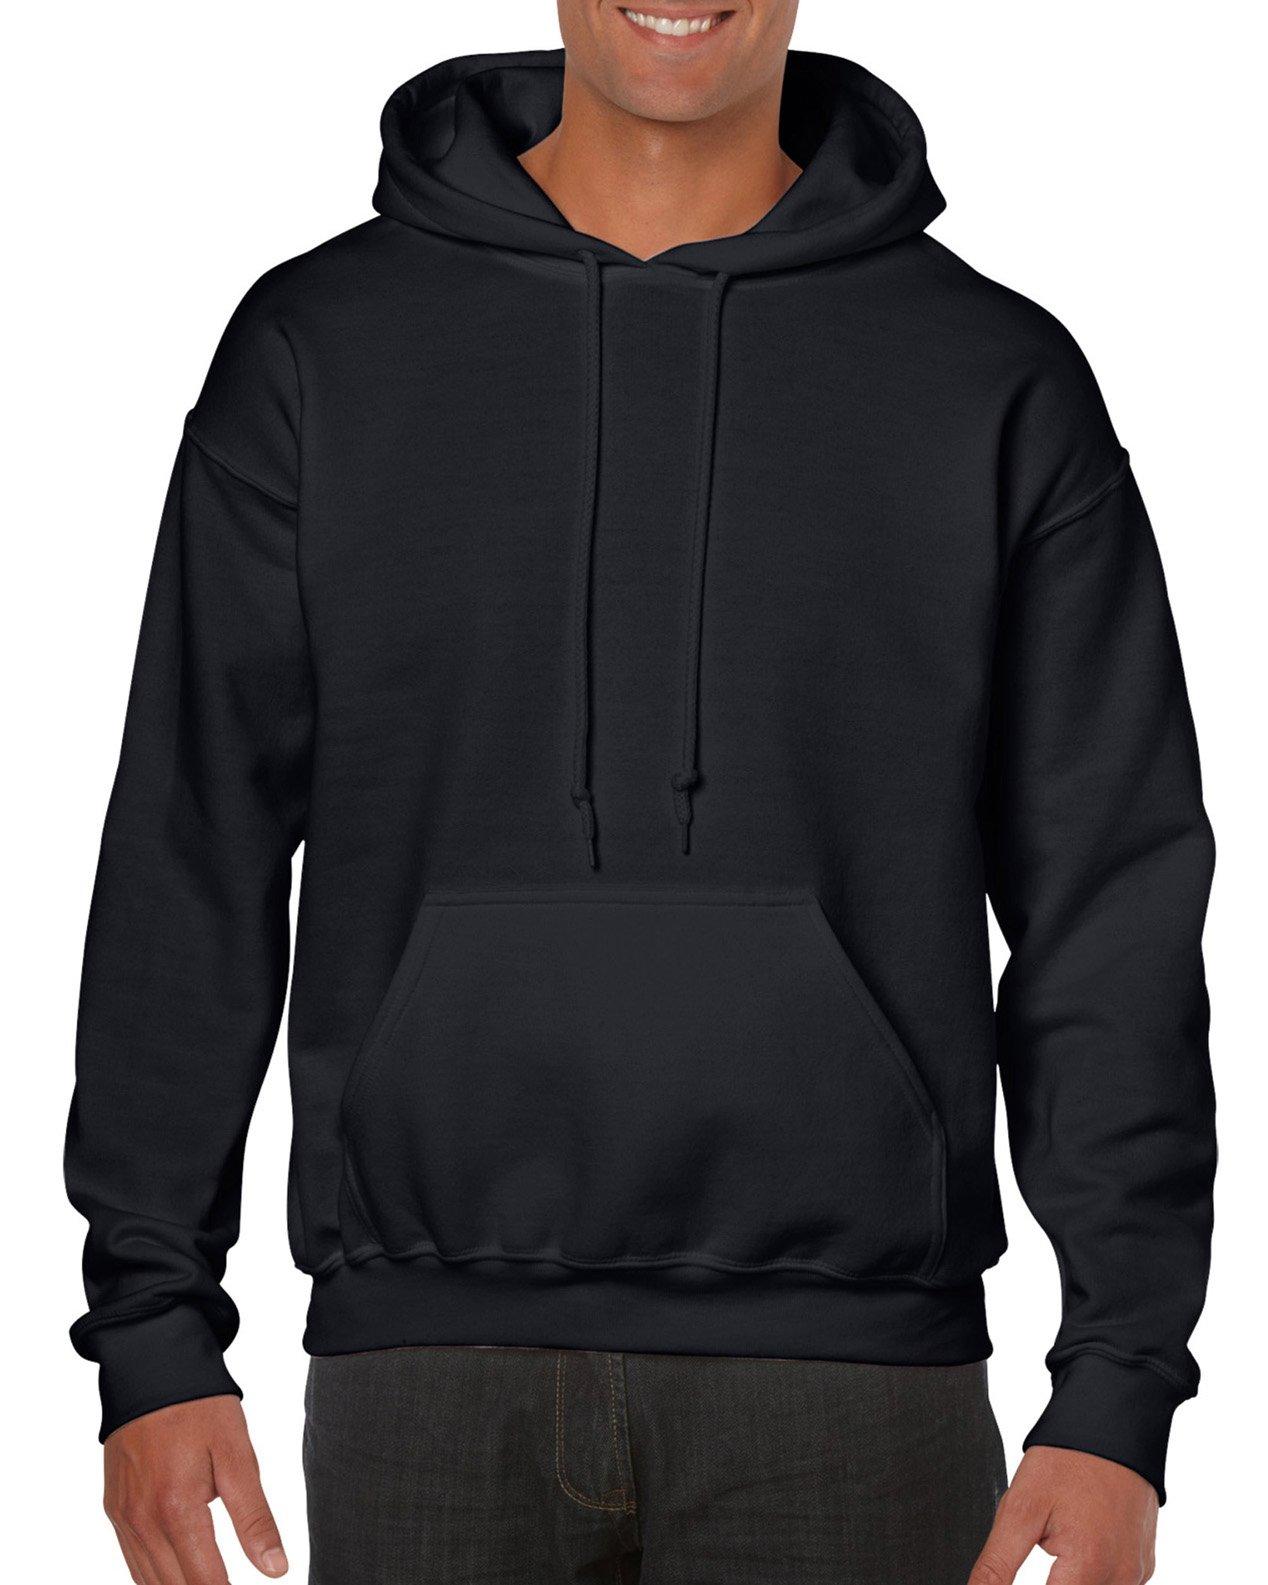 Gildan G18500 Heavy Blend Adult Hooded Sweatshirt L 1 Royal 1 Dark Heather